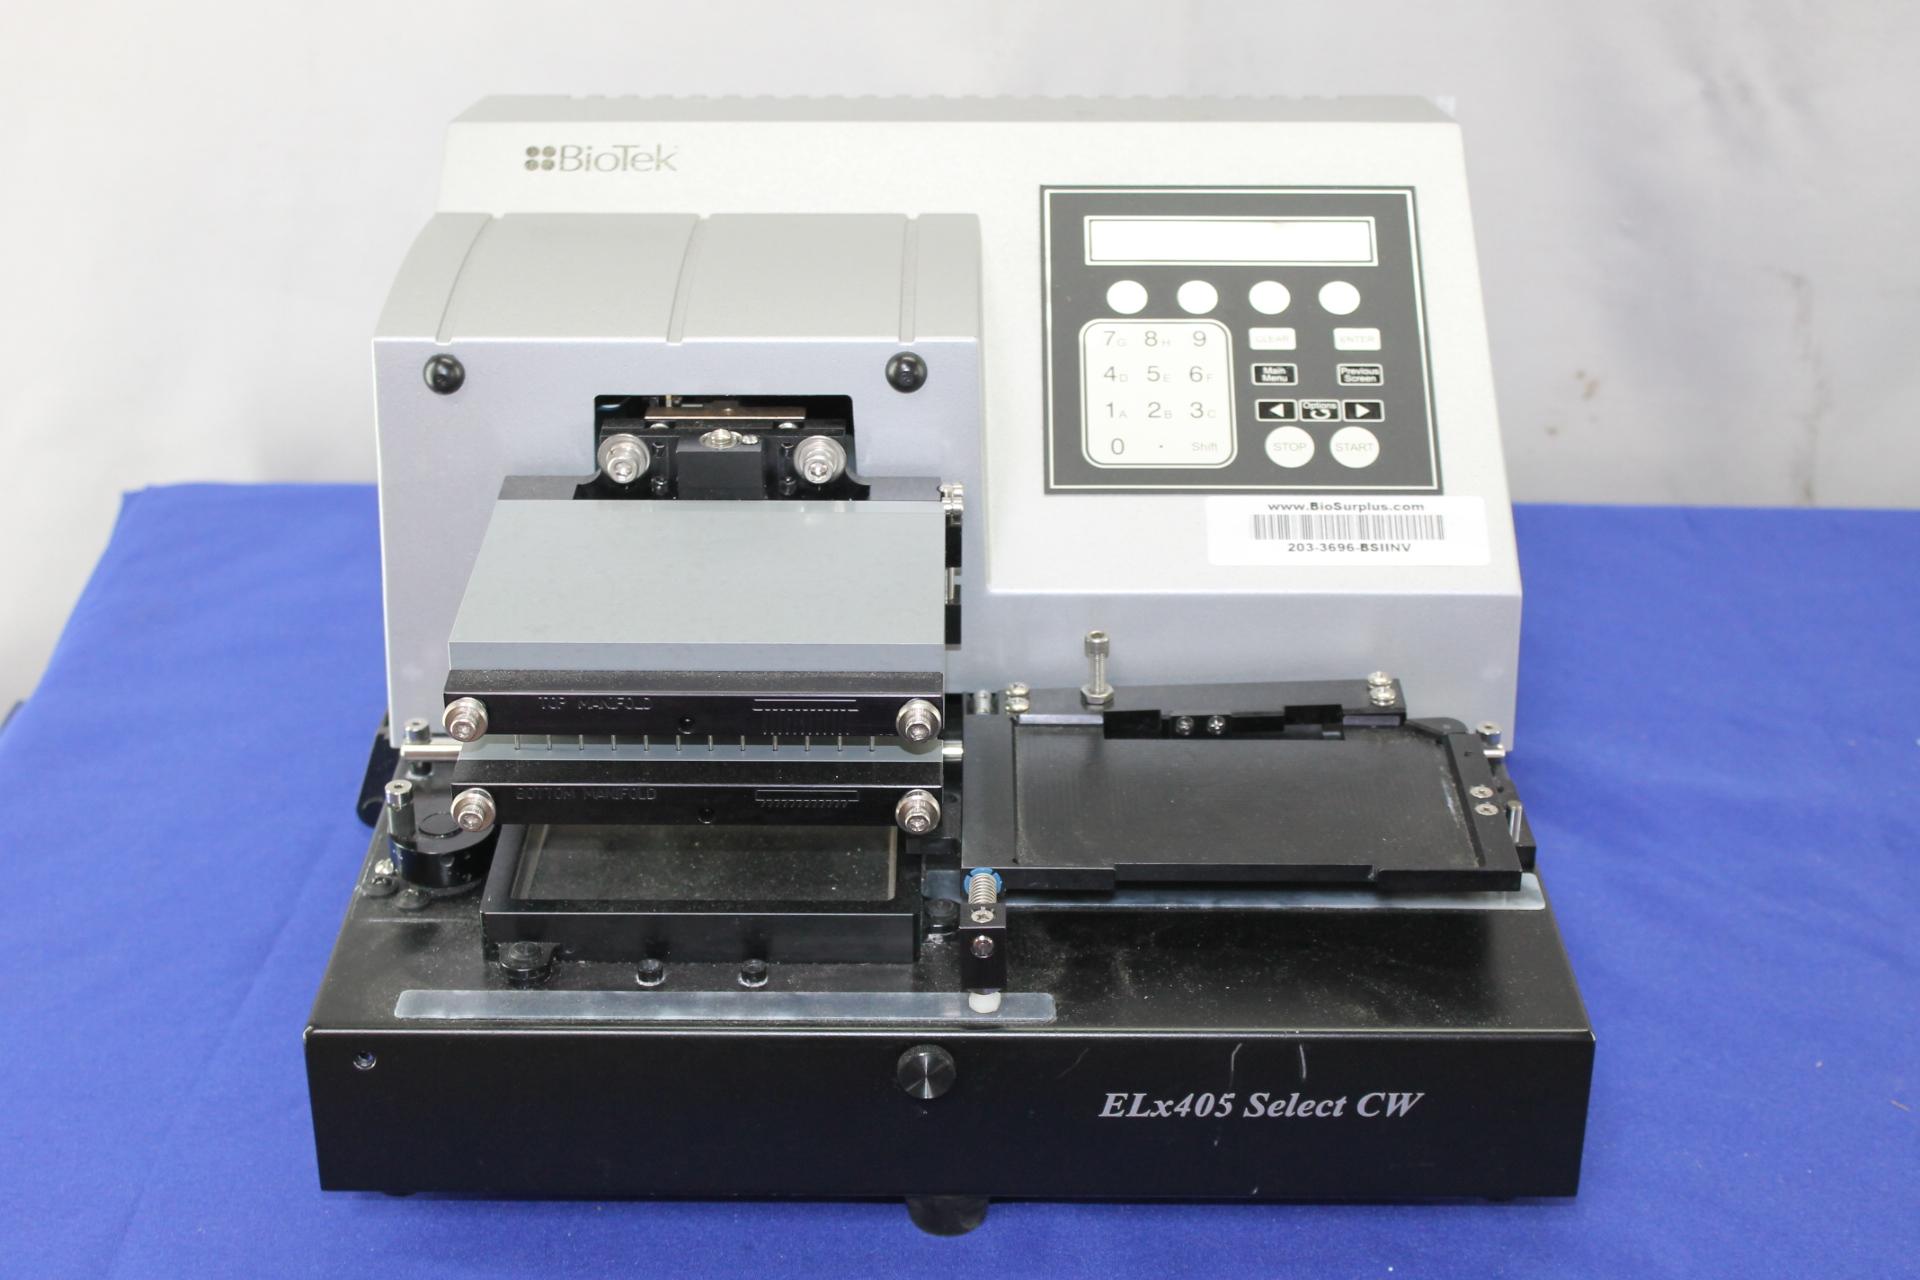 Biotek Instruments Elx405 Select CW (203-3696)